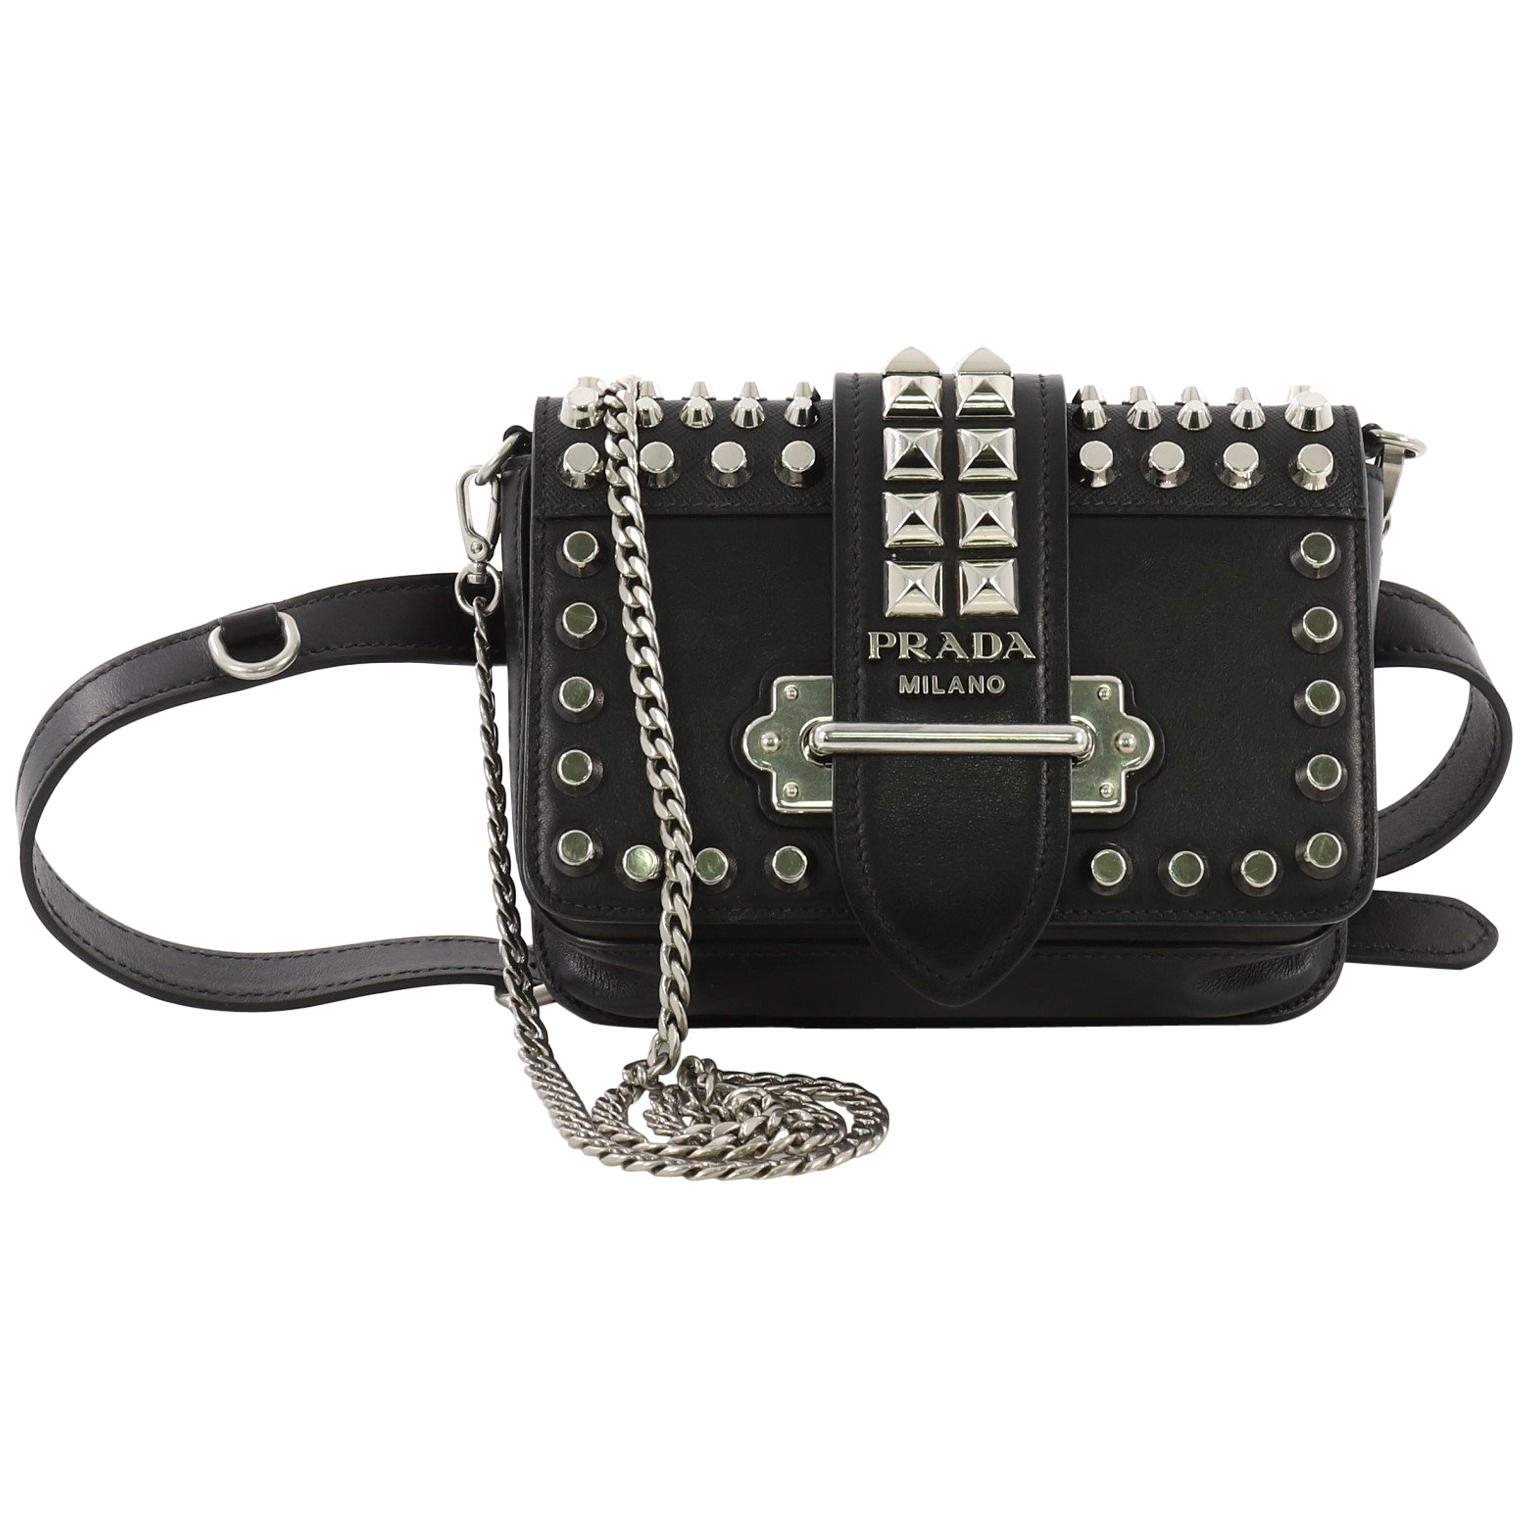 d40a3756b0c Rebag Handbags and Purses - 1stdibs